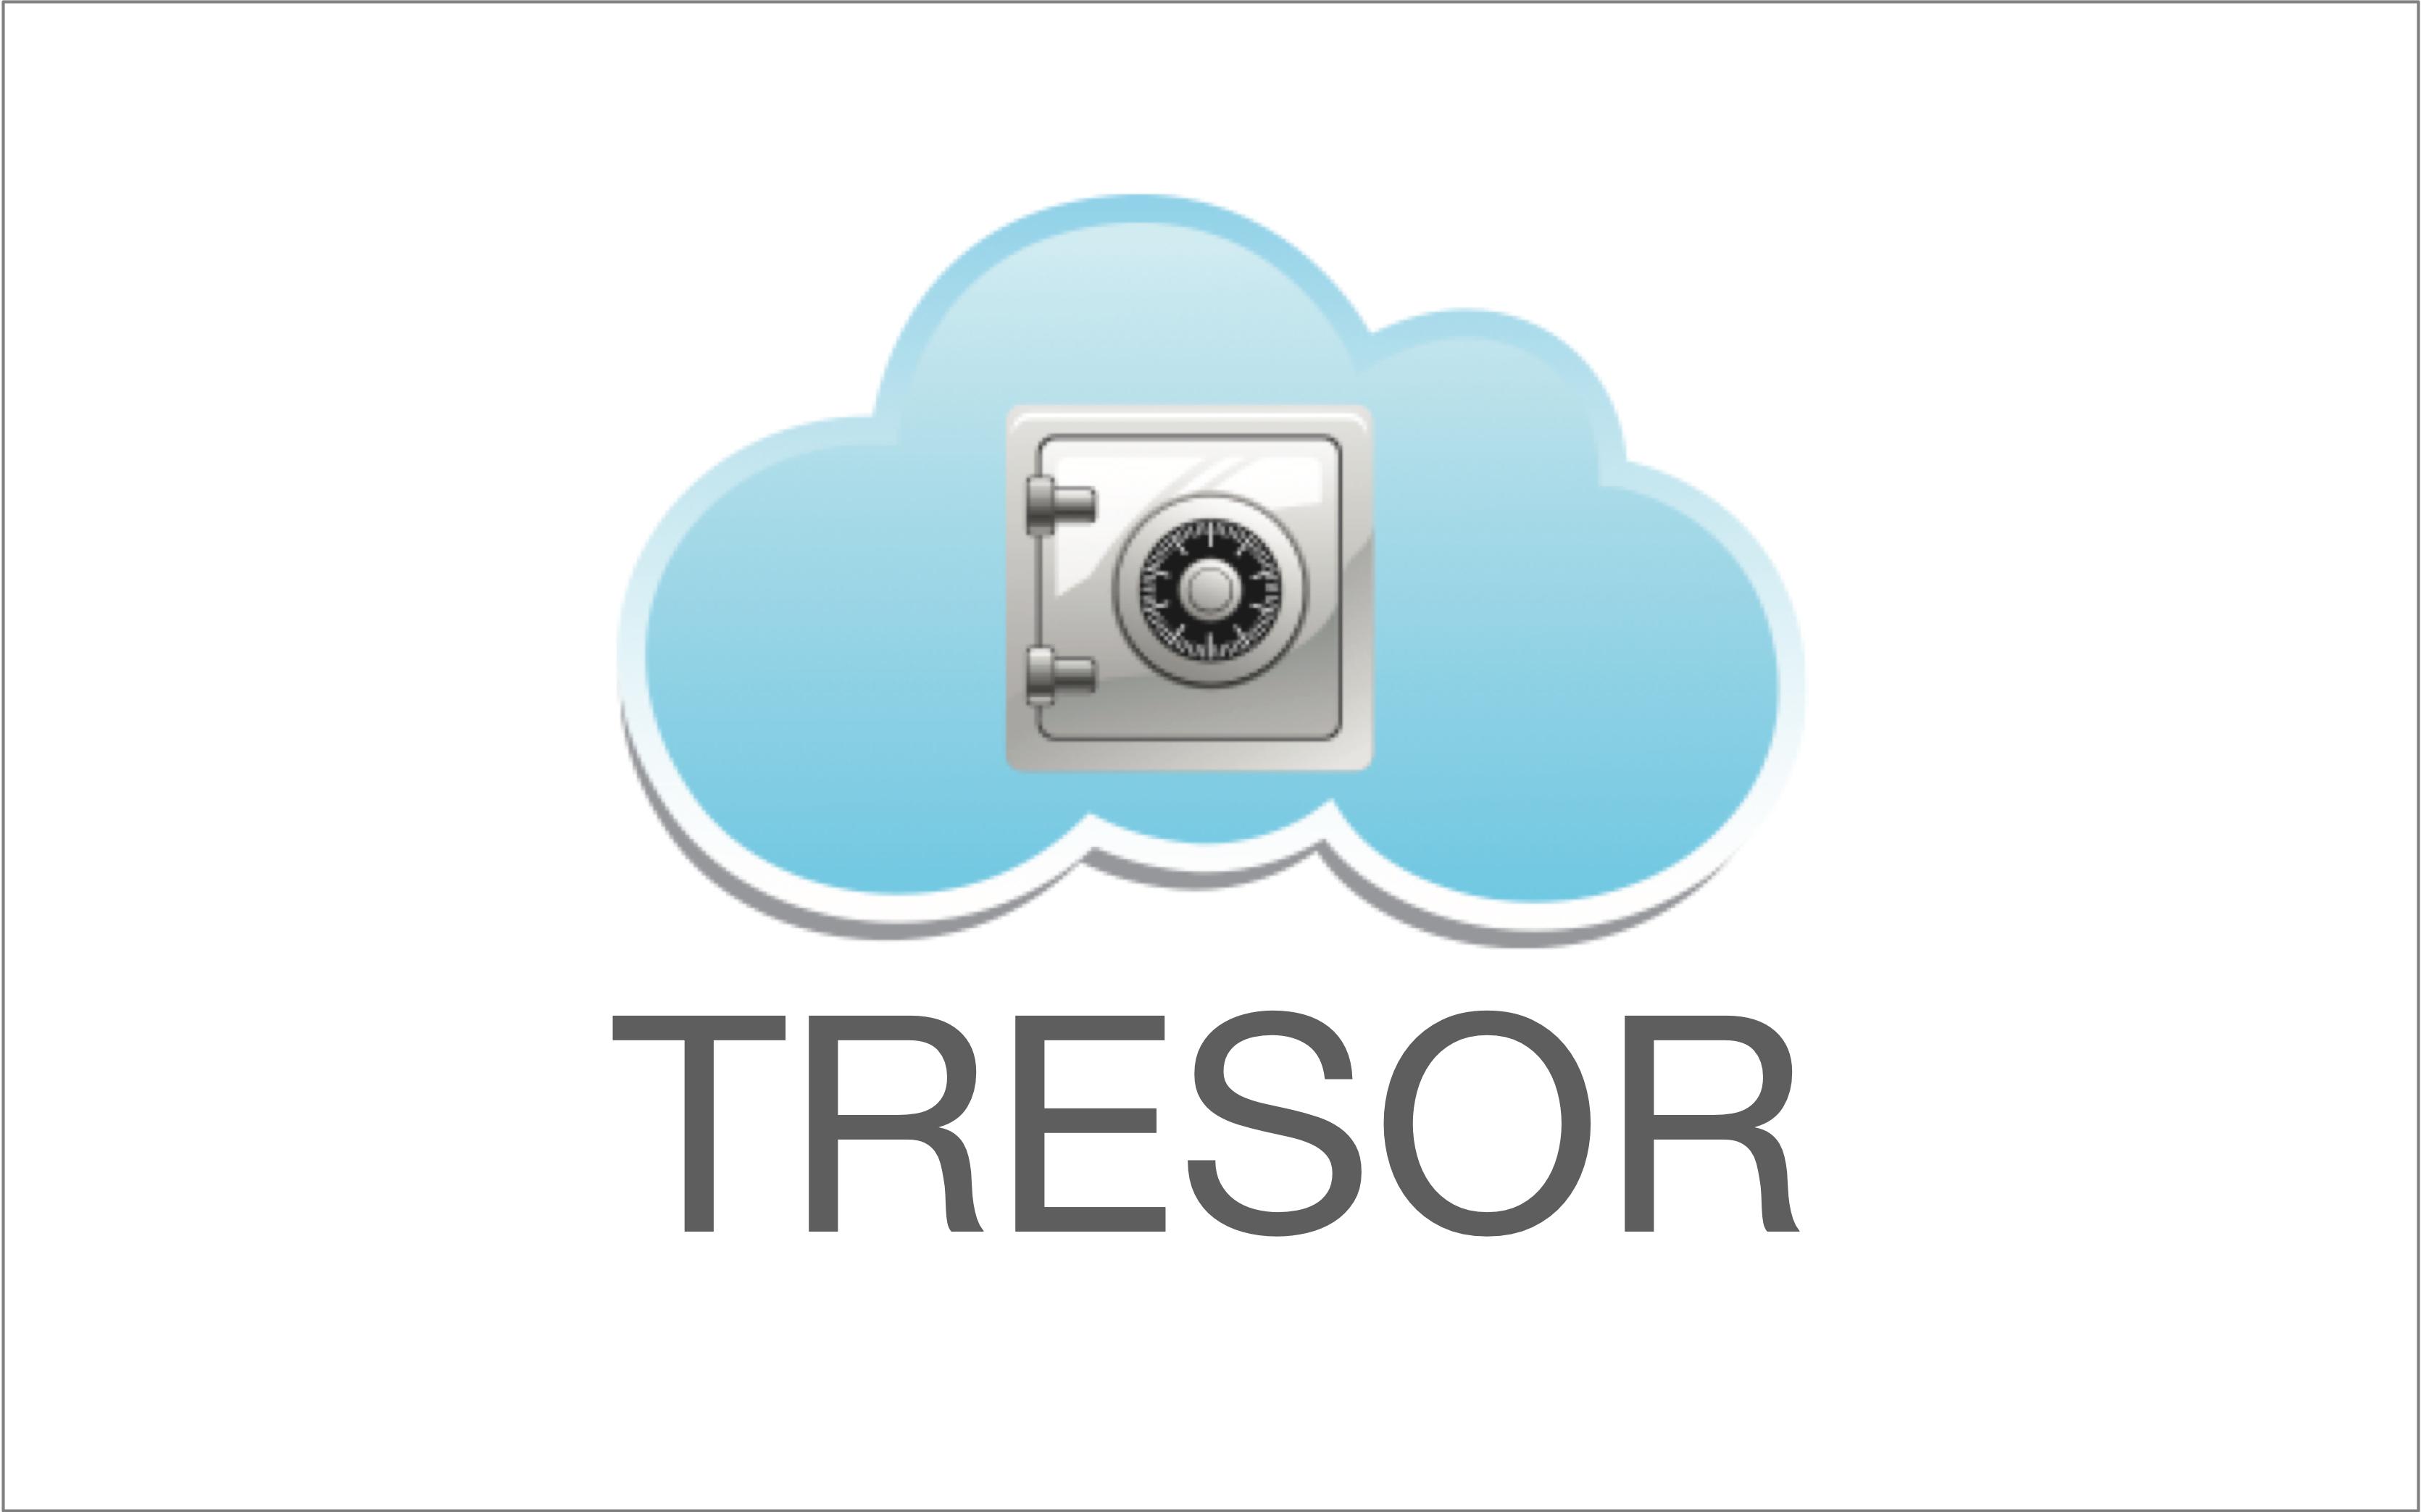 TRESOR Project (2012-2015)